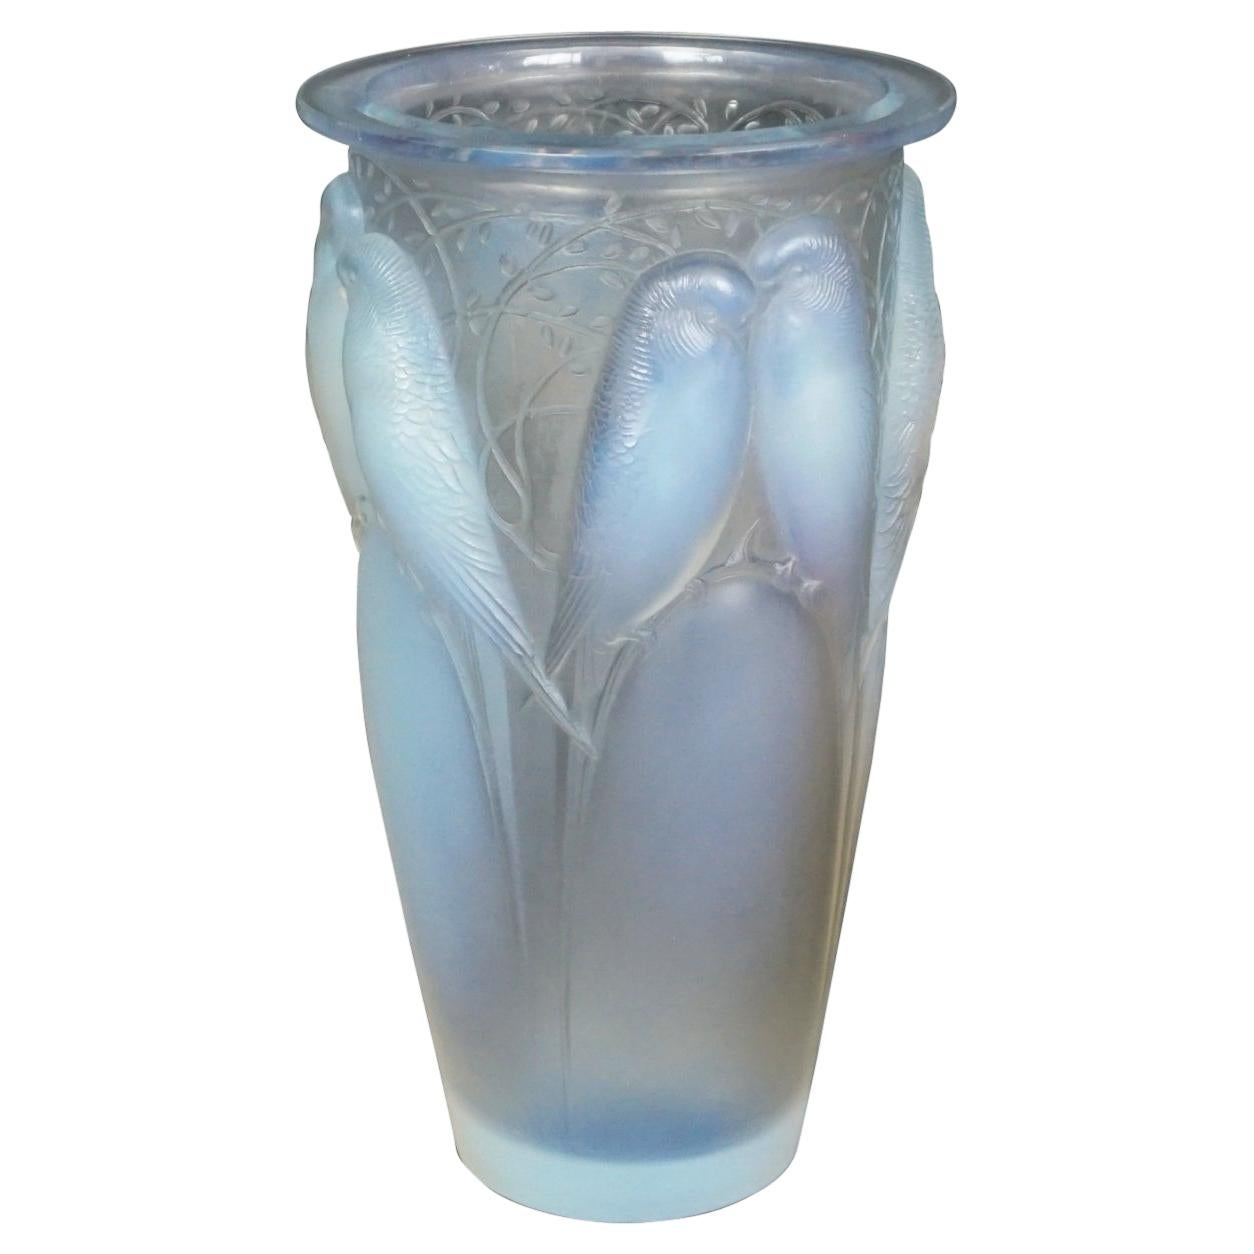 "René Lalique ""Ceylan"" an Art Deco Opalescent Glass Vase French, Circa 1930"